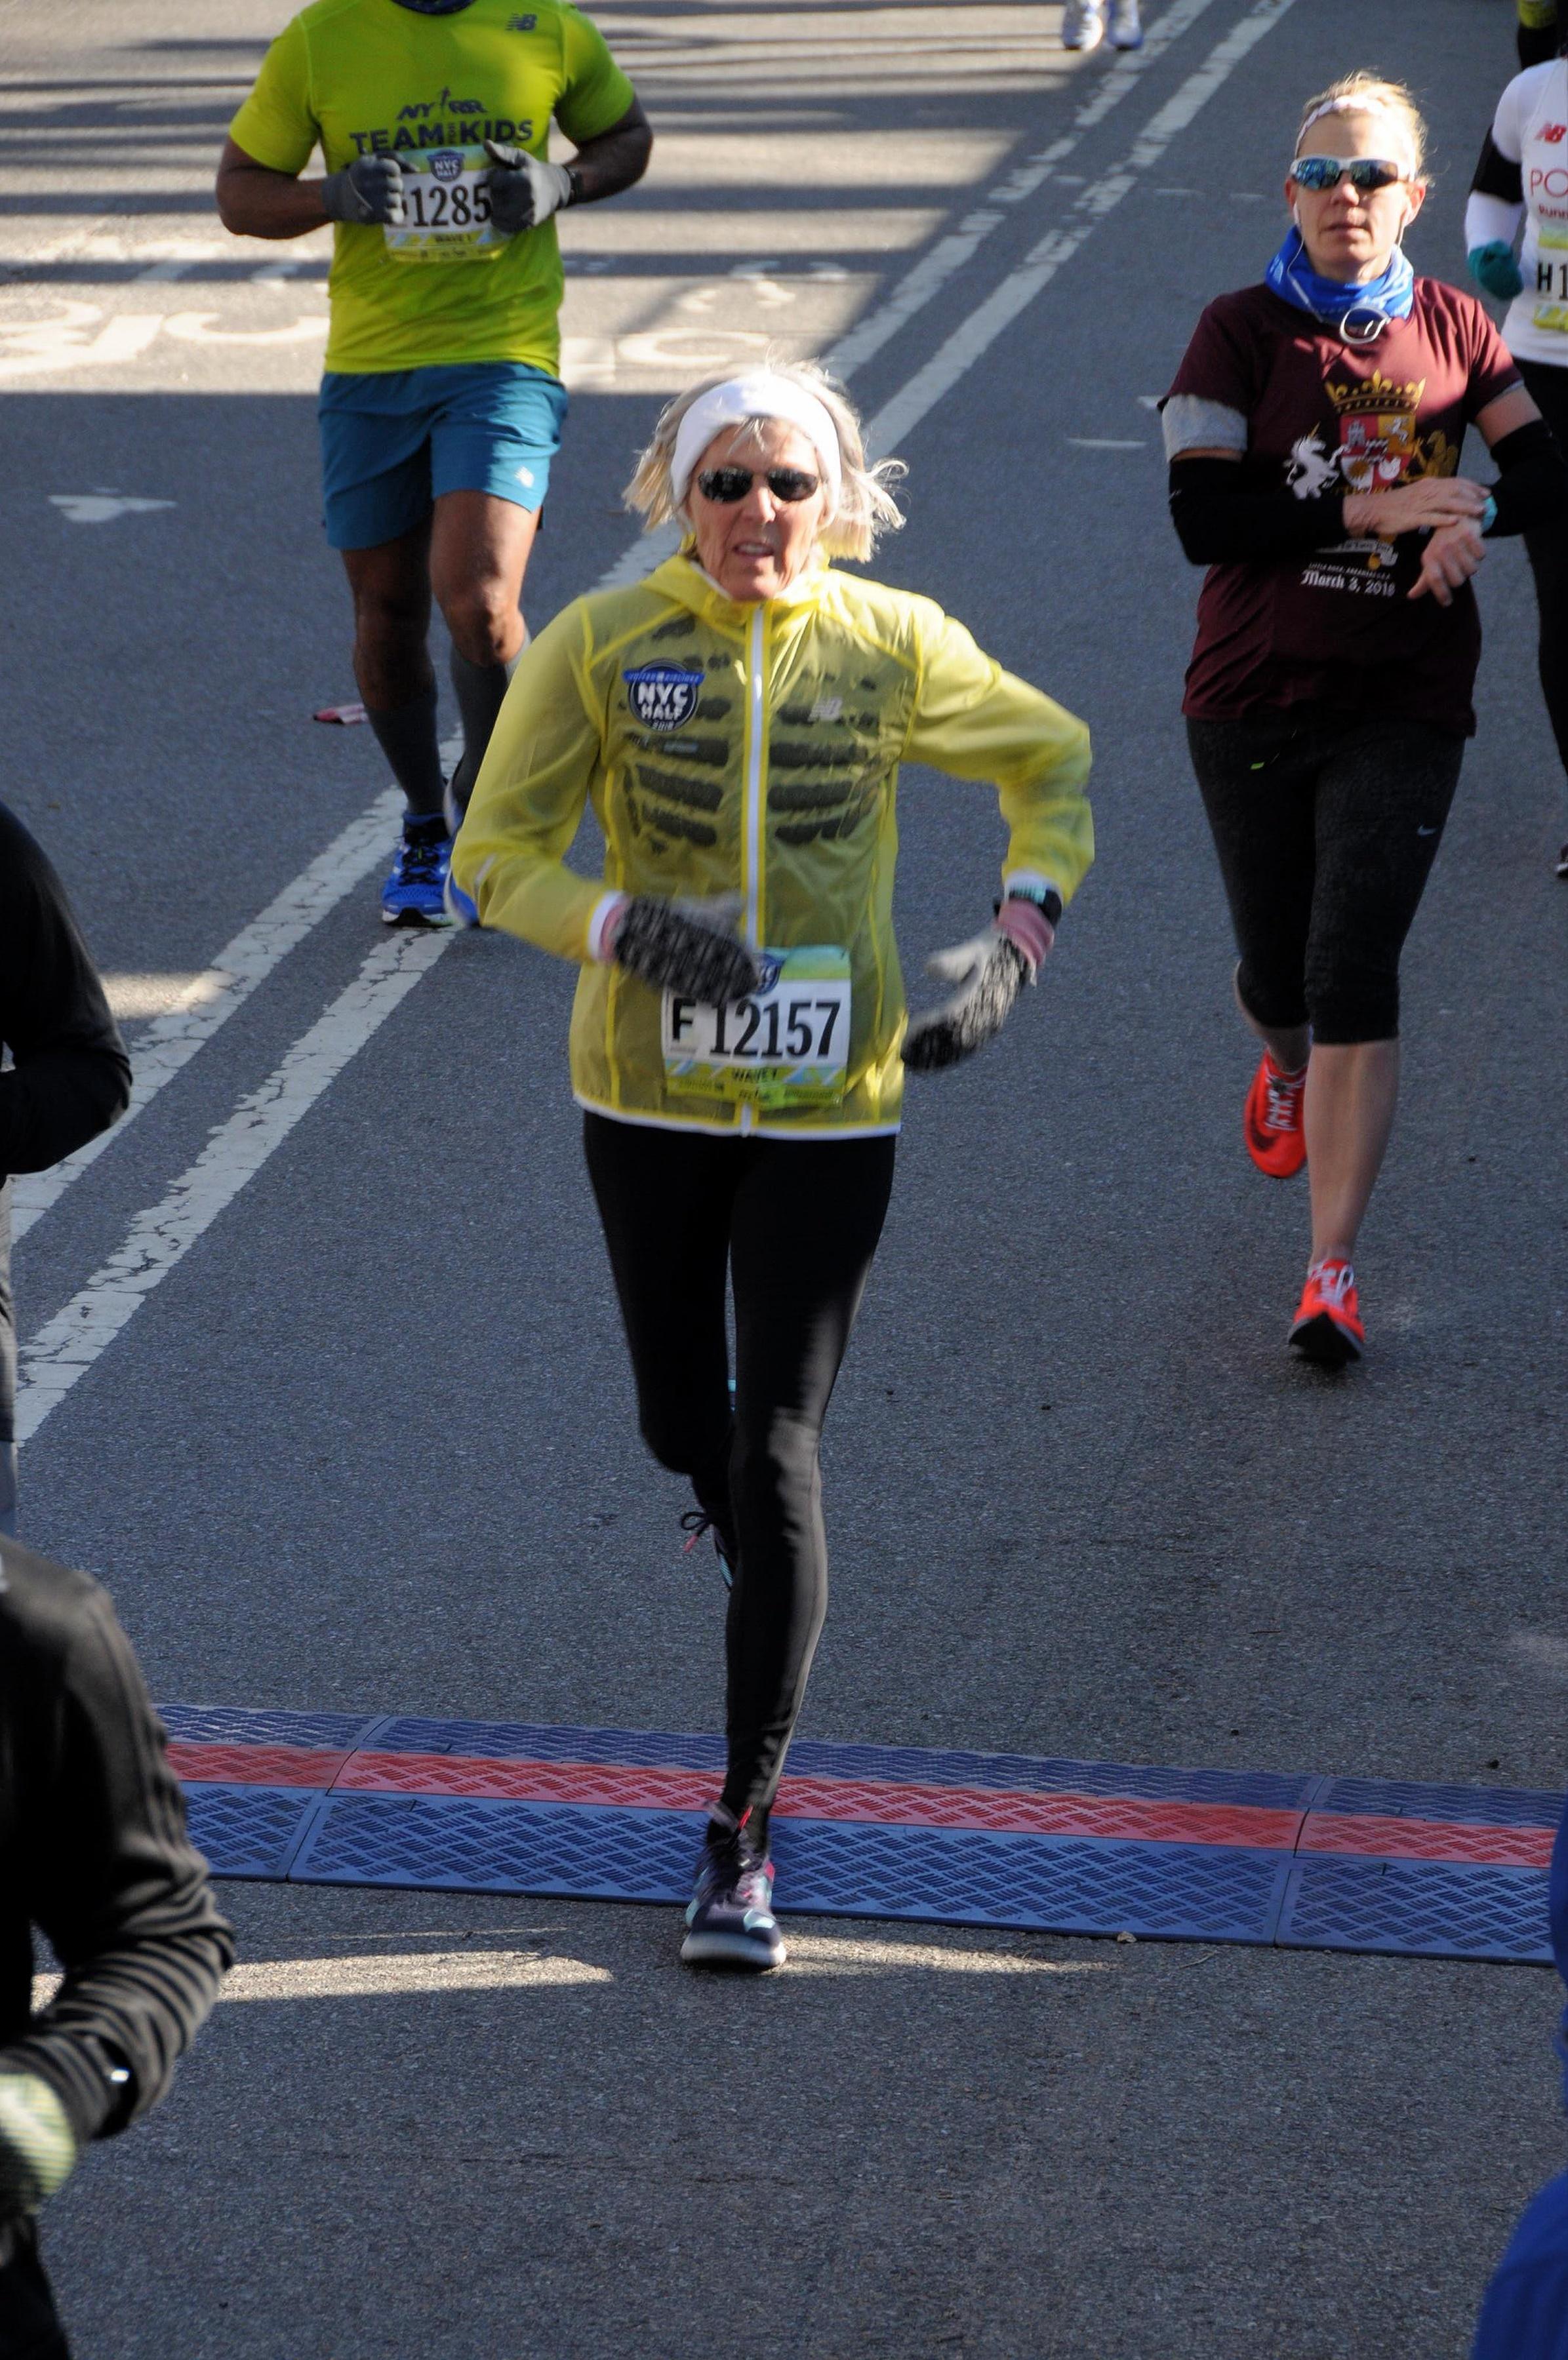 The finish line for NYC Half Marathon, March 18, 2018.